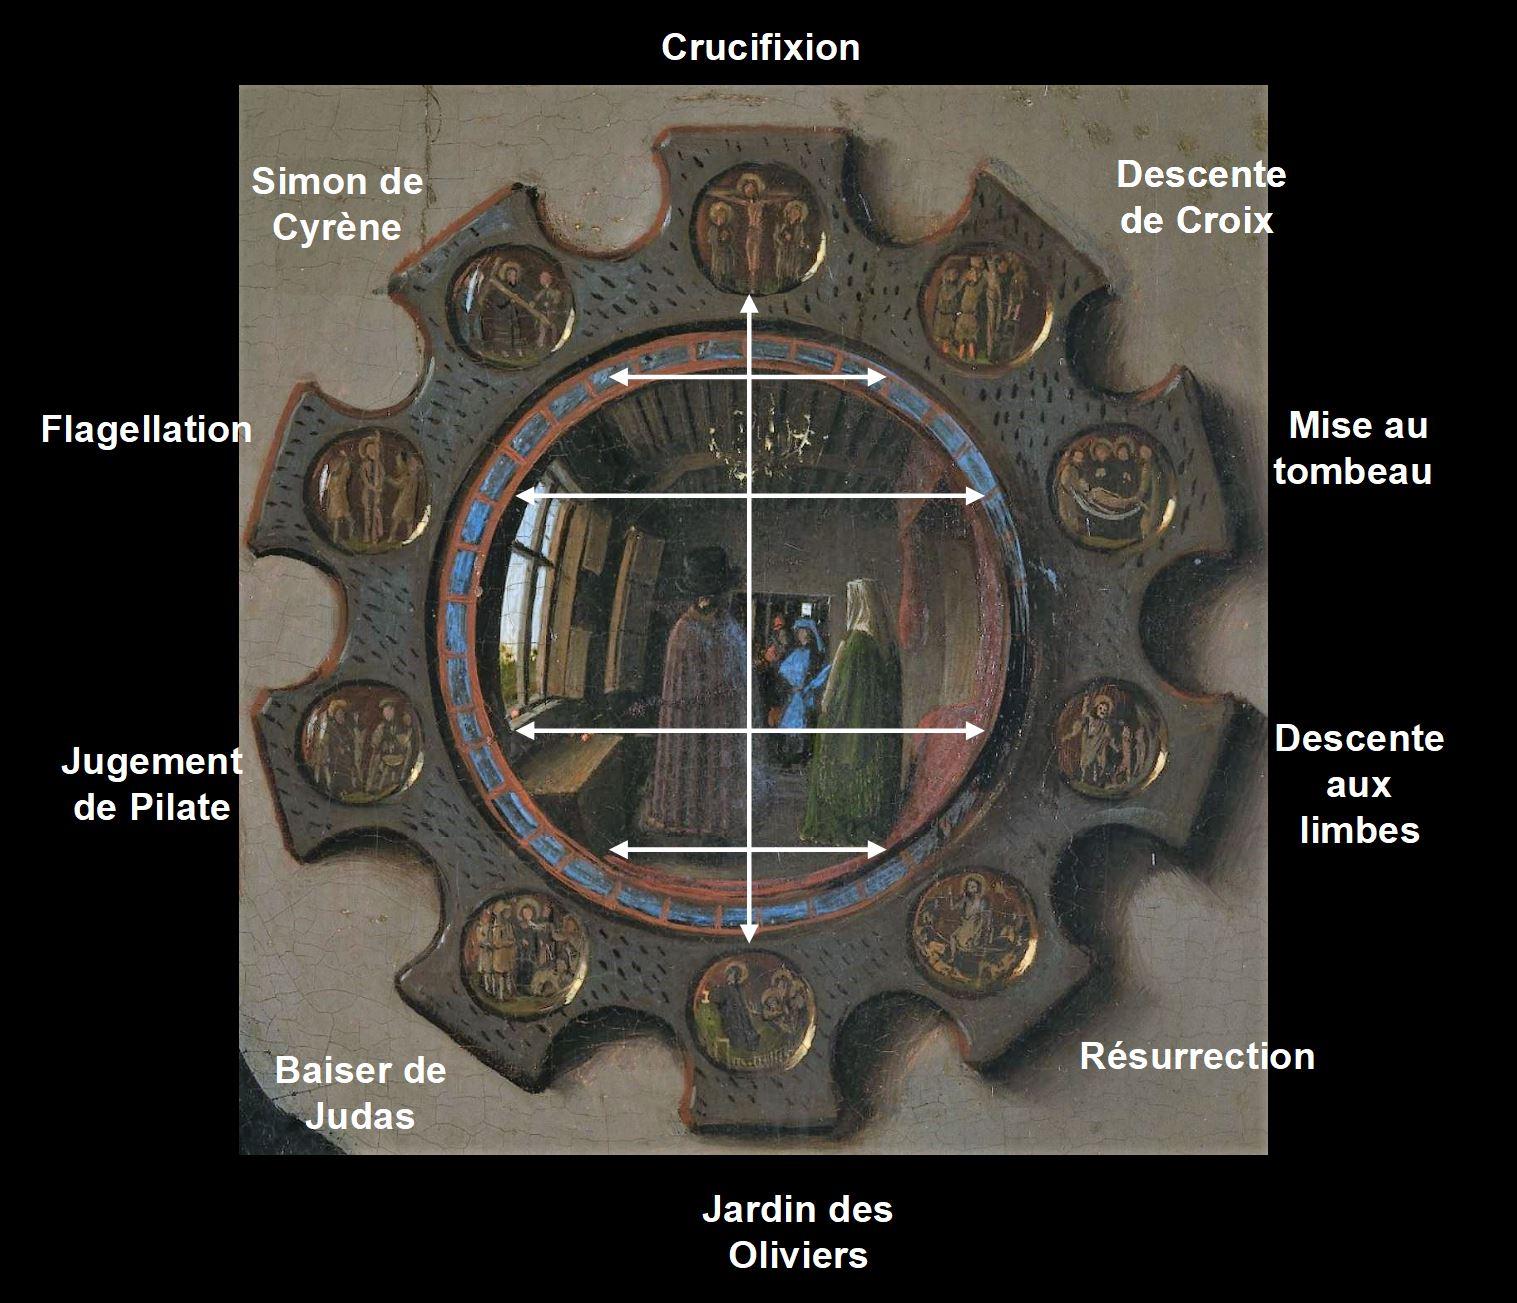 Van_Eyck 1434 _Arnolfini_Portrait miroir schema 2